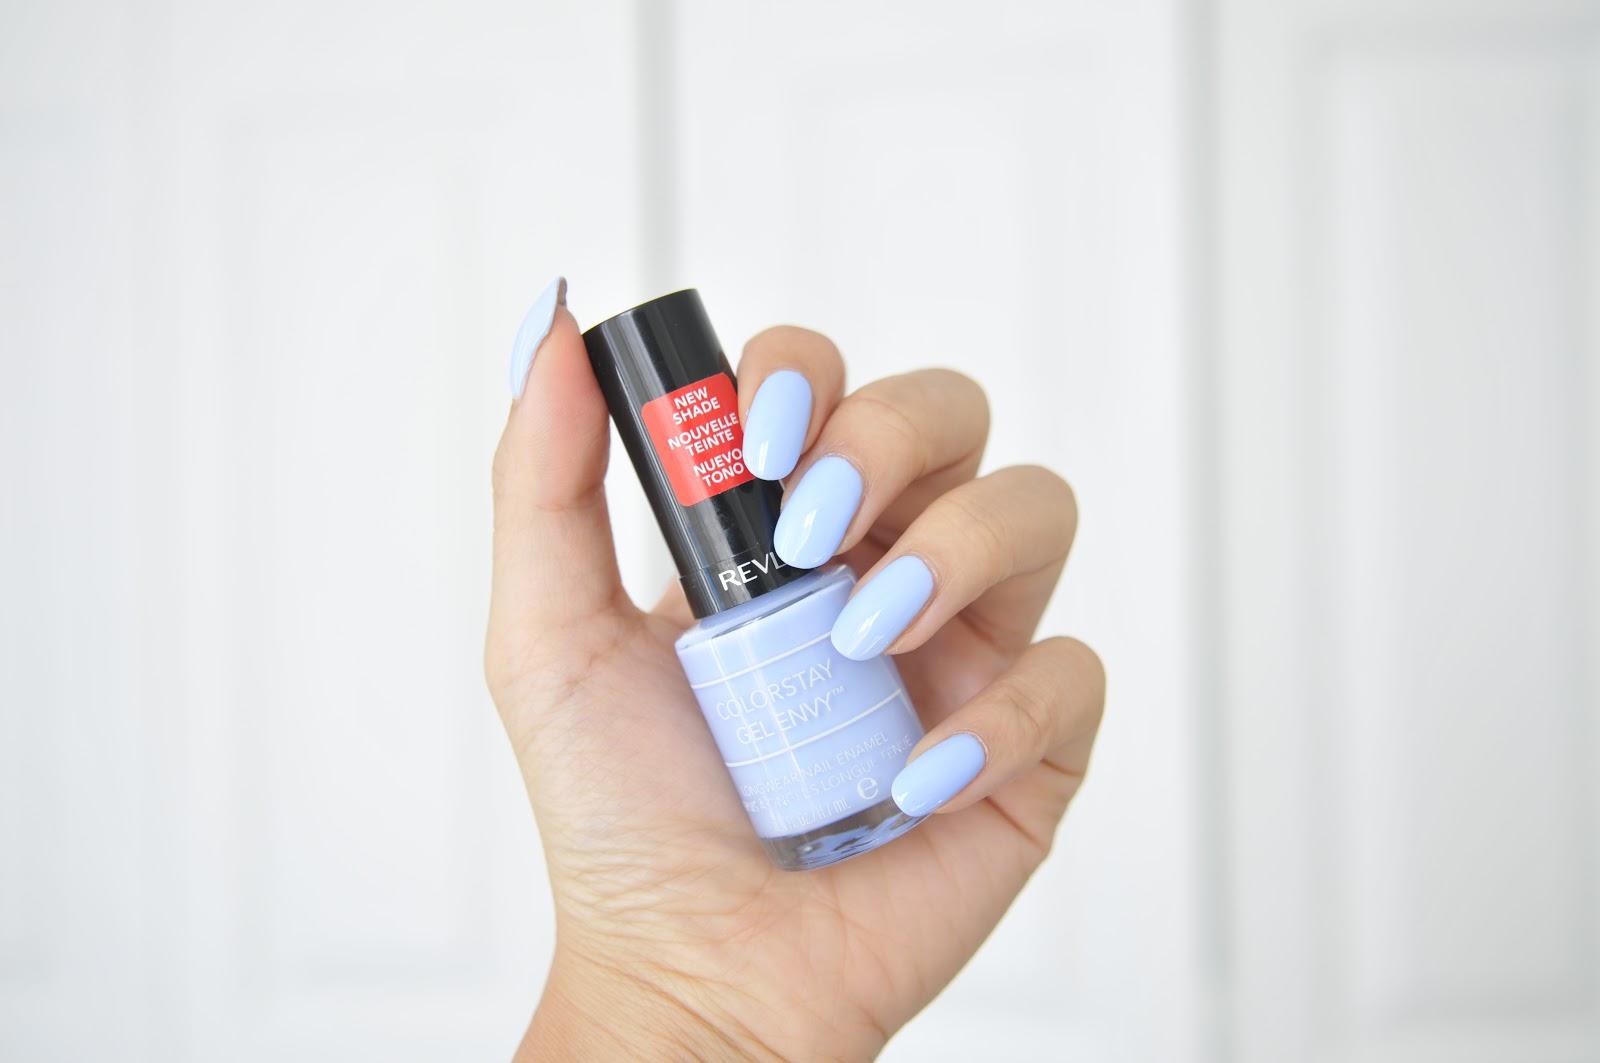 gel envy nail polish review